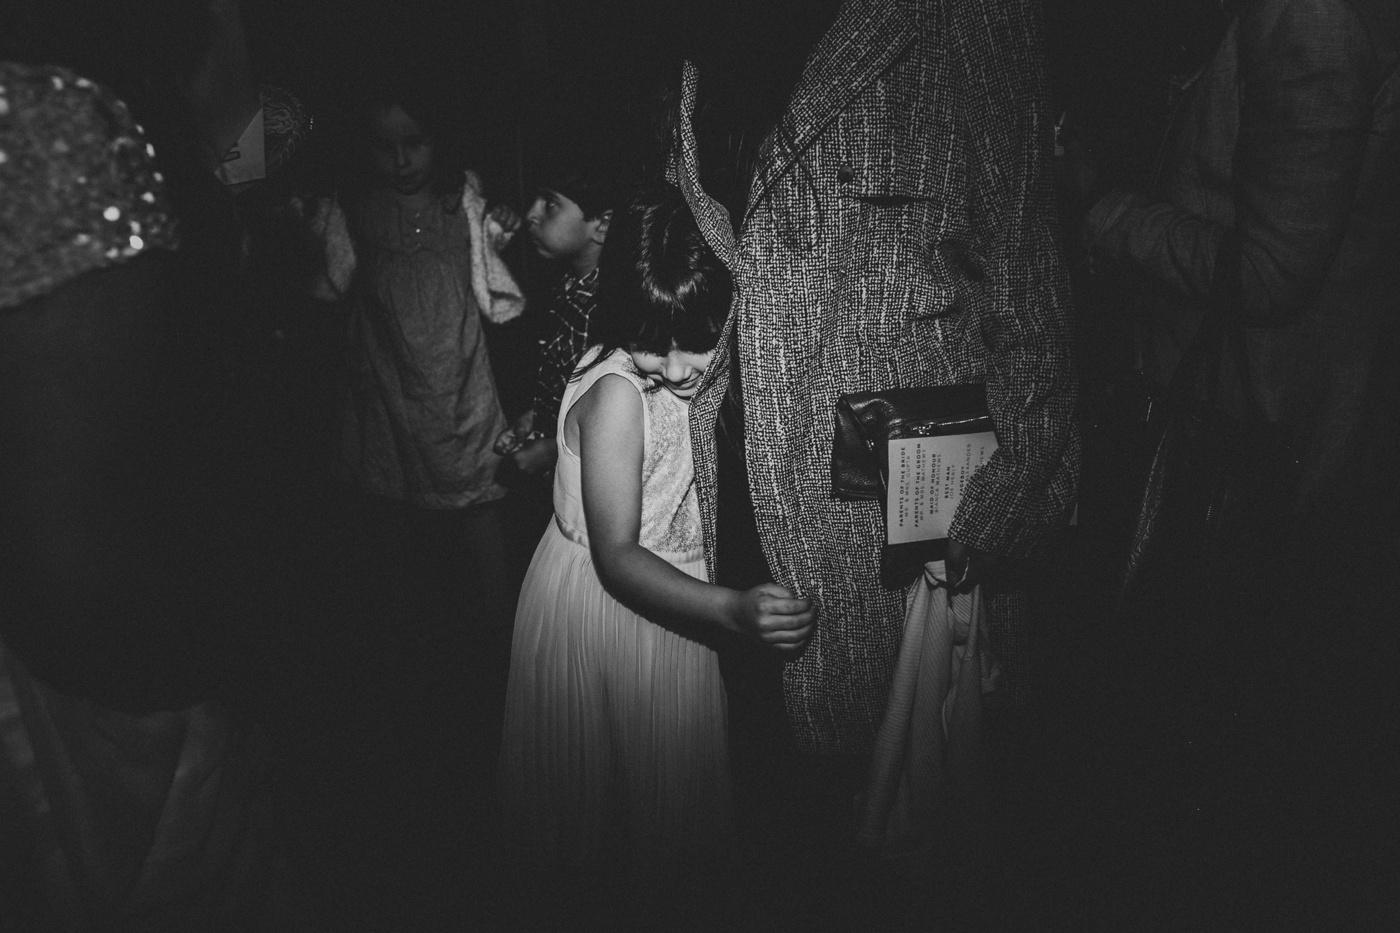 anitadaniel_melbourne-scienceworks-relaxed-fun-geek-wedding_melbourne-candid-wedding-photography_62